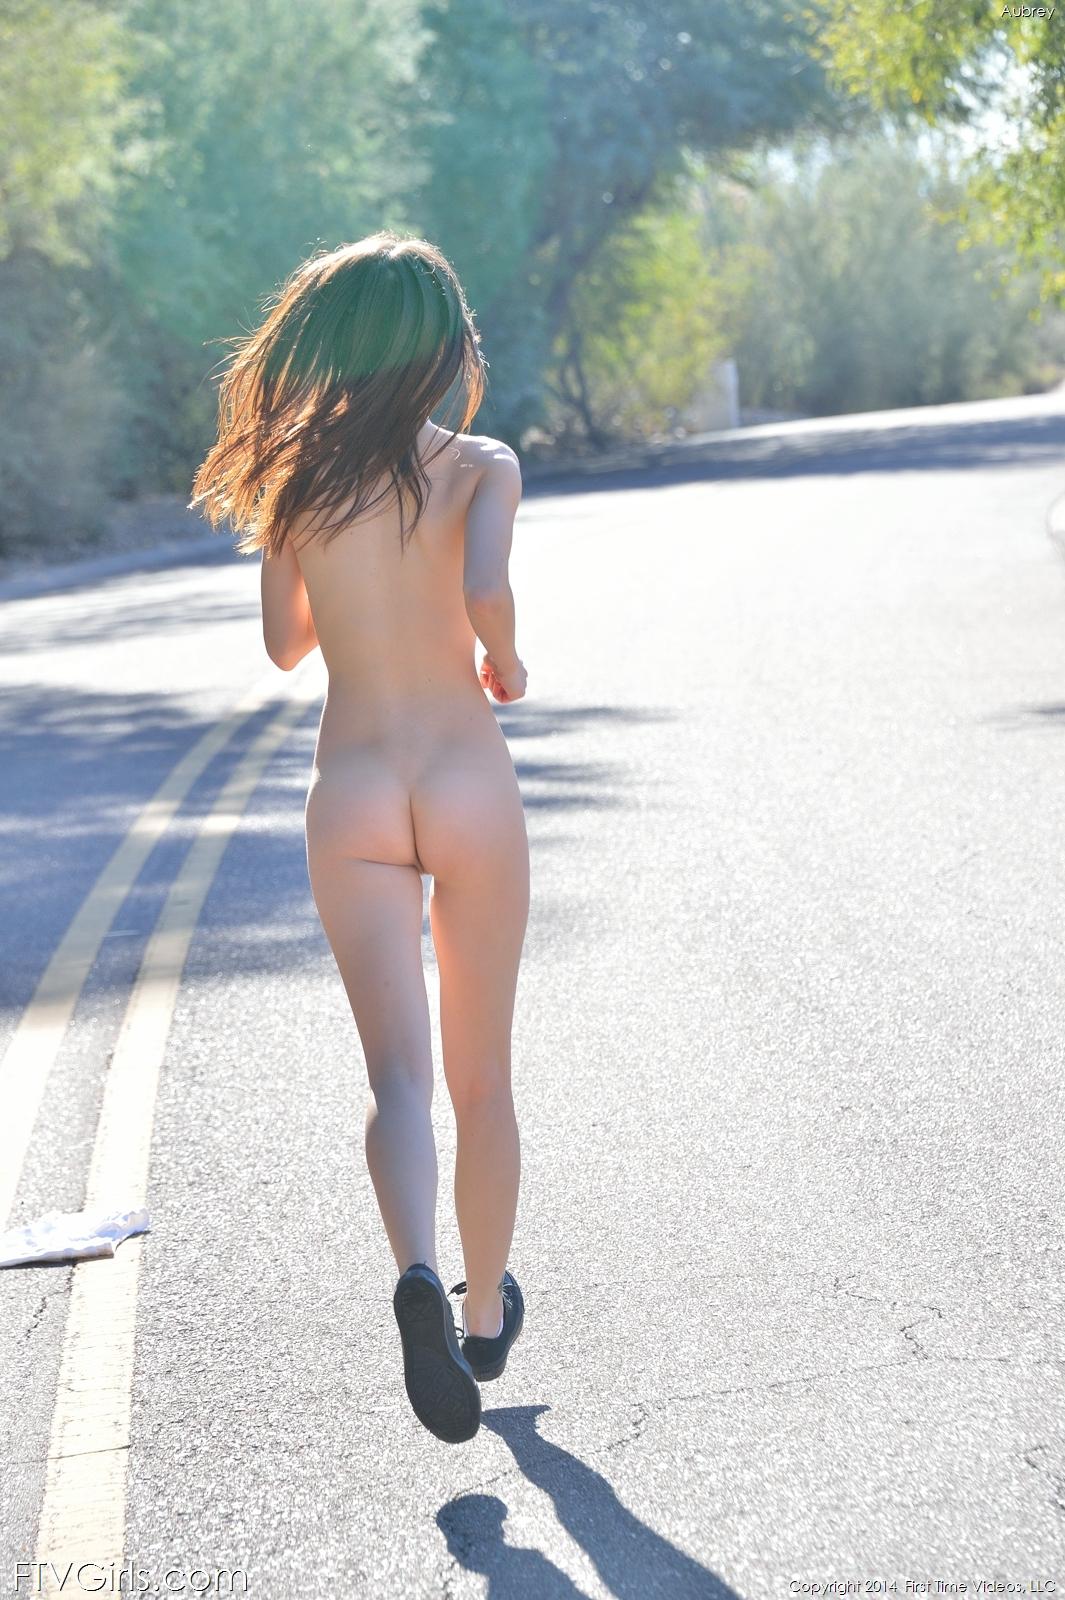 aubrey-shorts-nude-public-road-ftvgirls-15